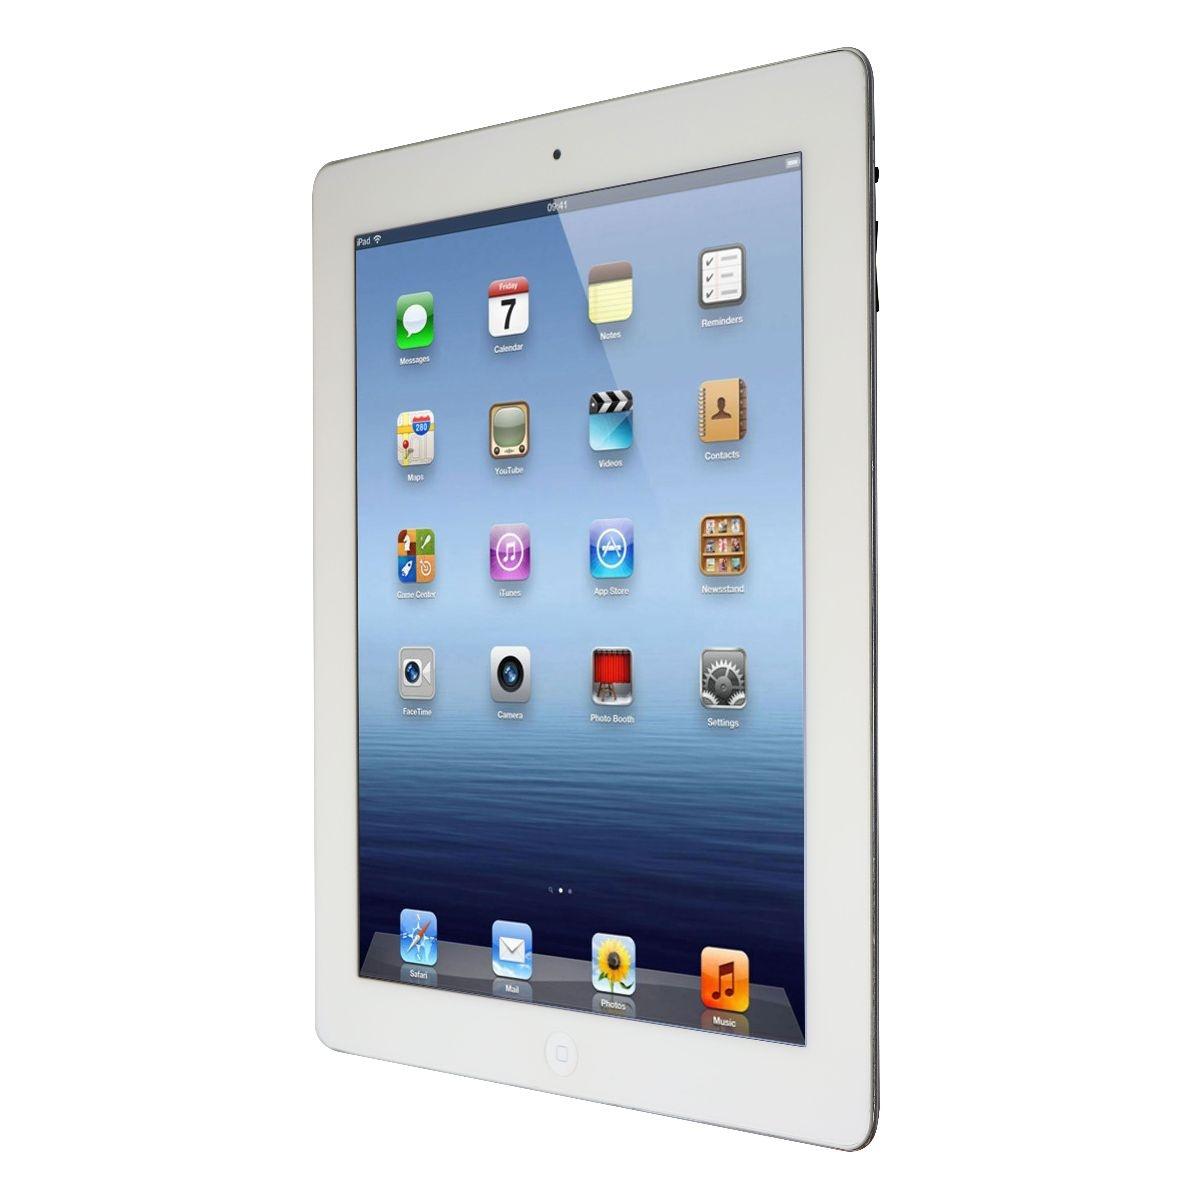 Apple iPad 9.7-inch (4th Gen) Tablet A1460 (GSM + Verizon) - 16GB / White